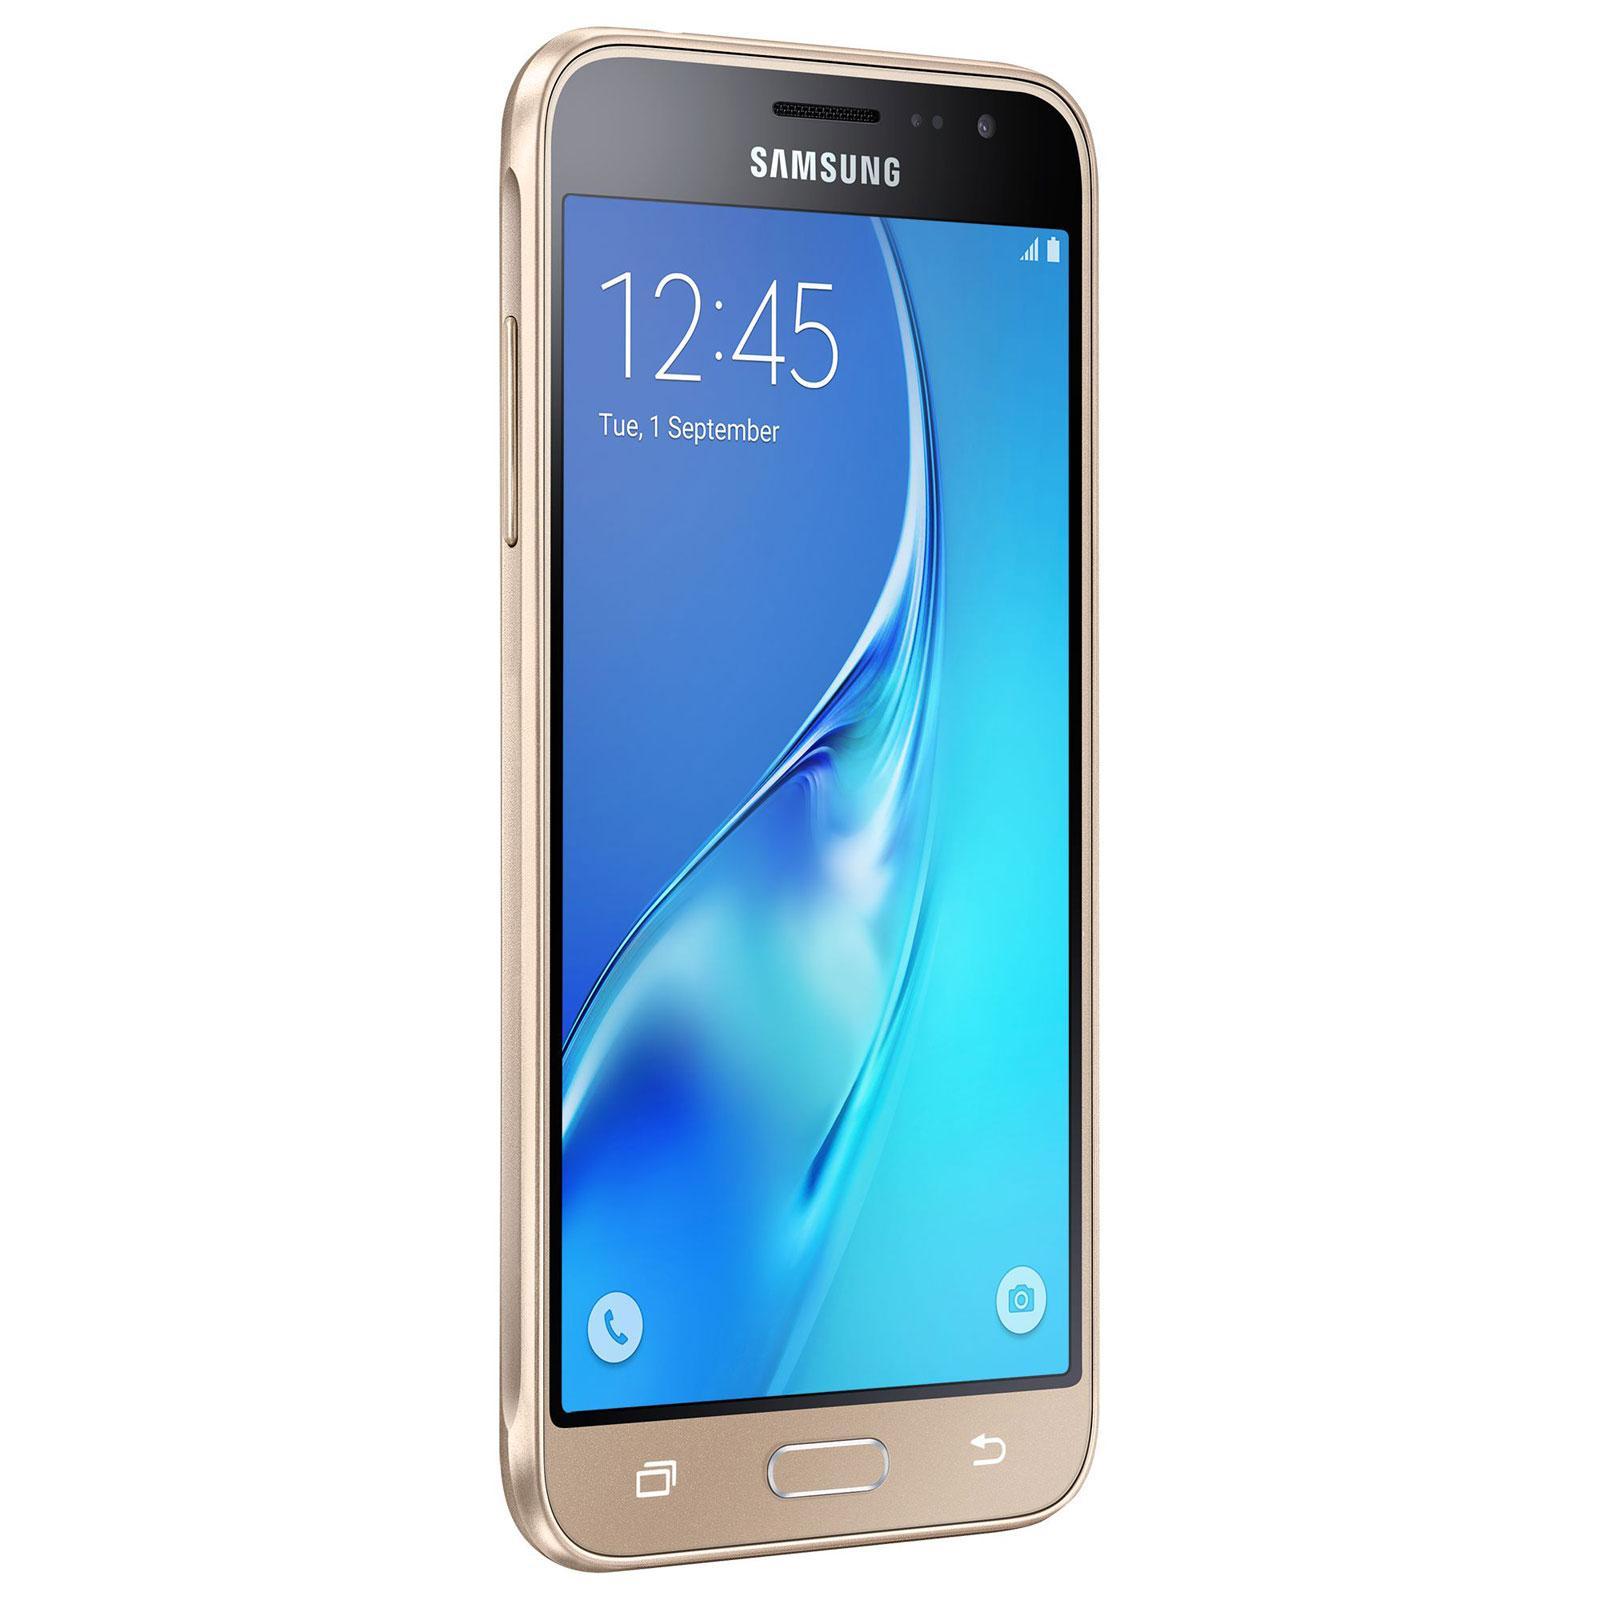 "Smartphone 5"" Samsung Galaxy J3 8Go"